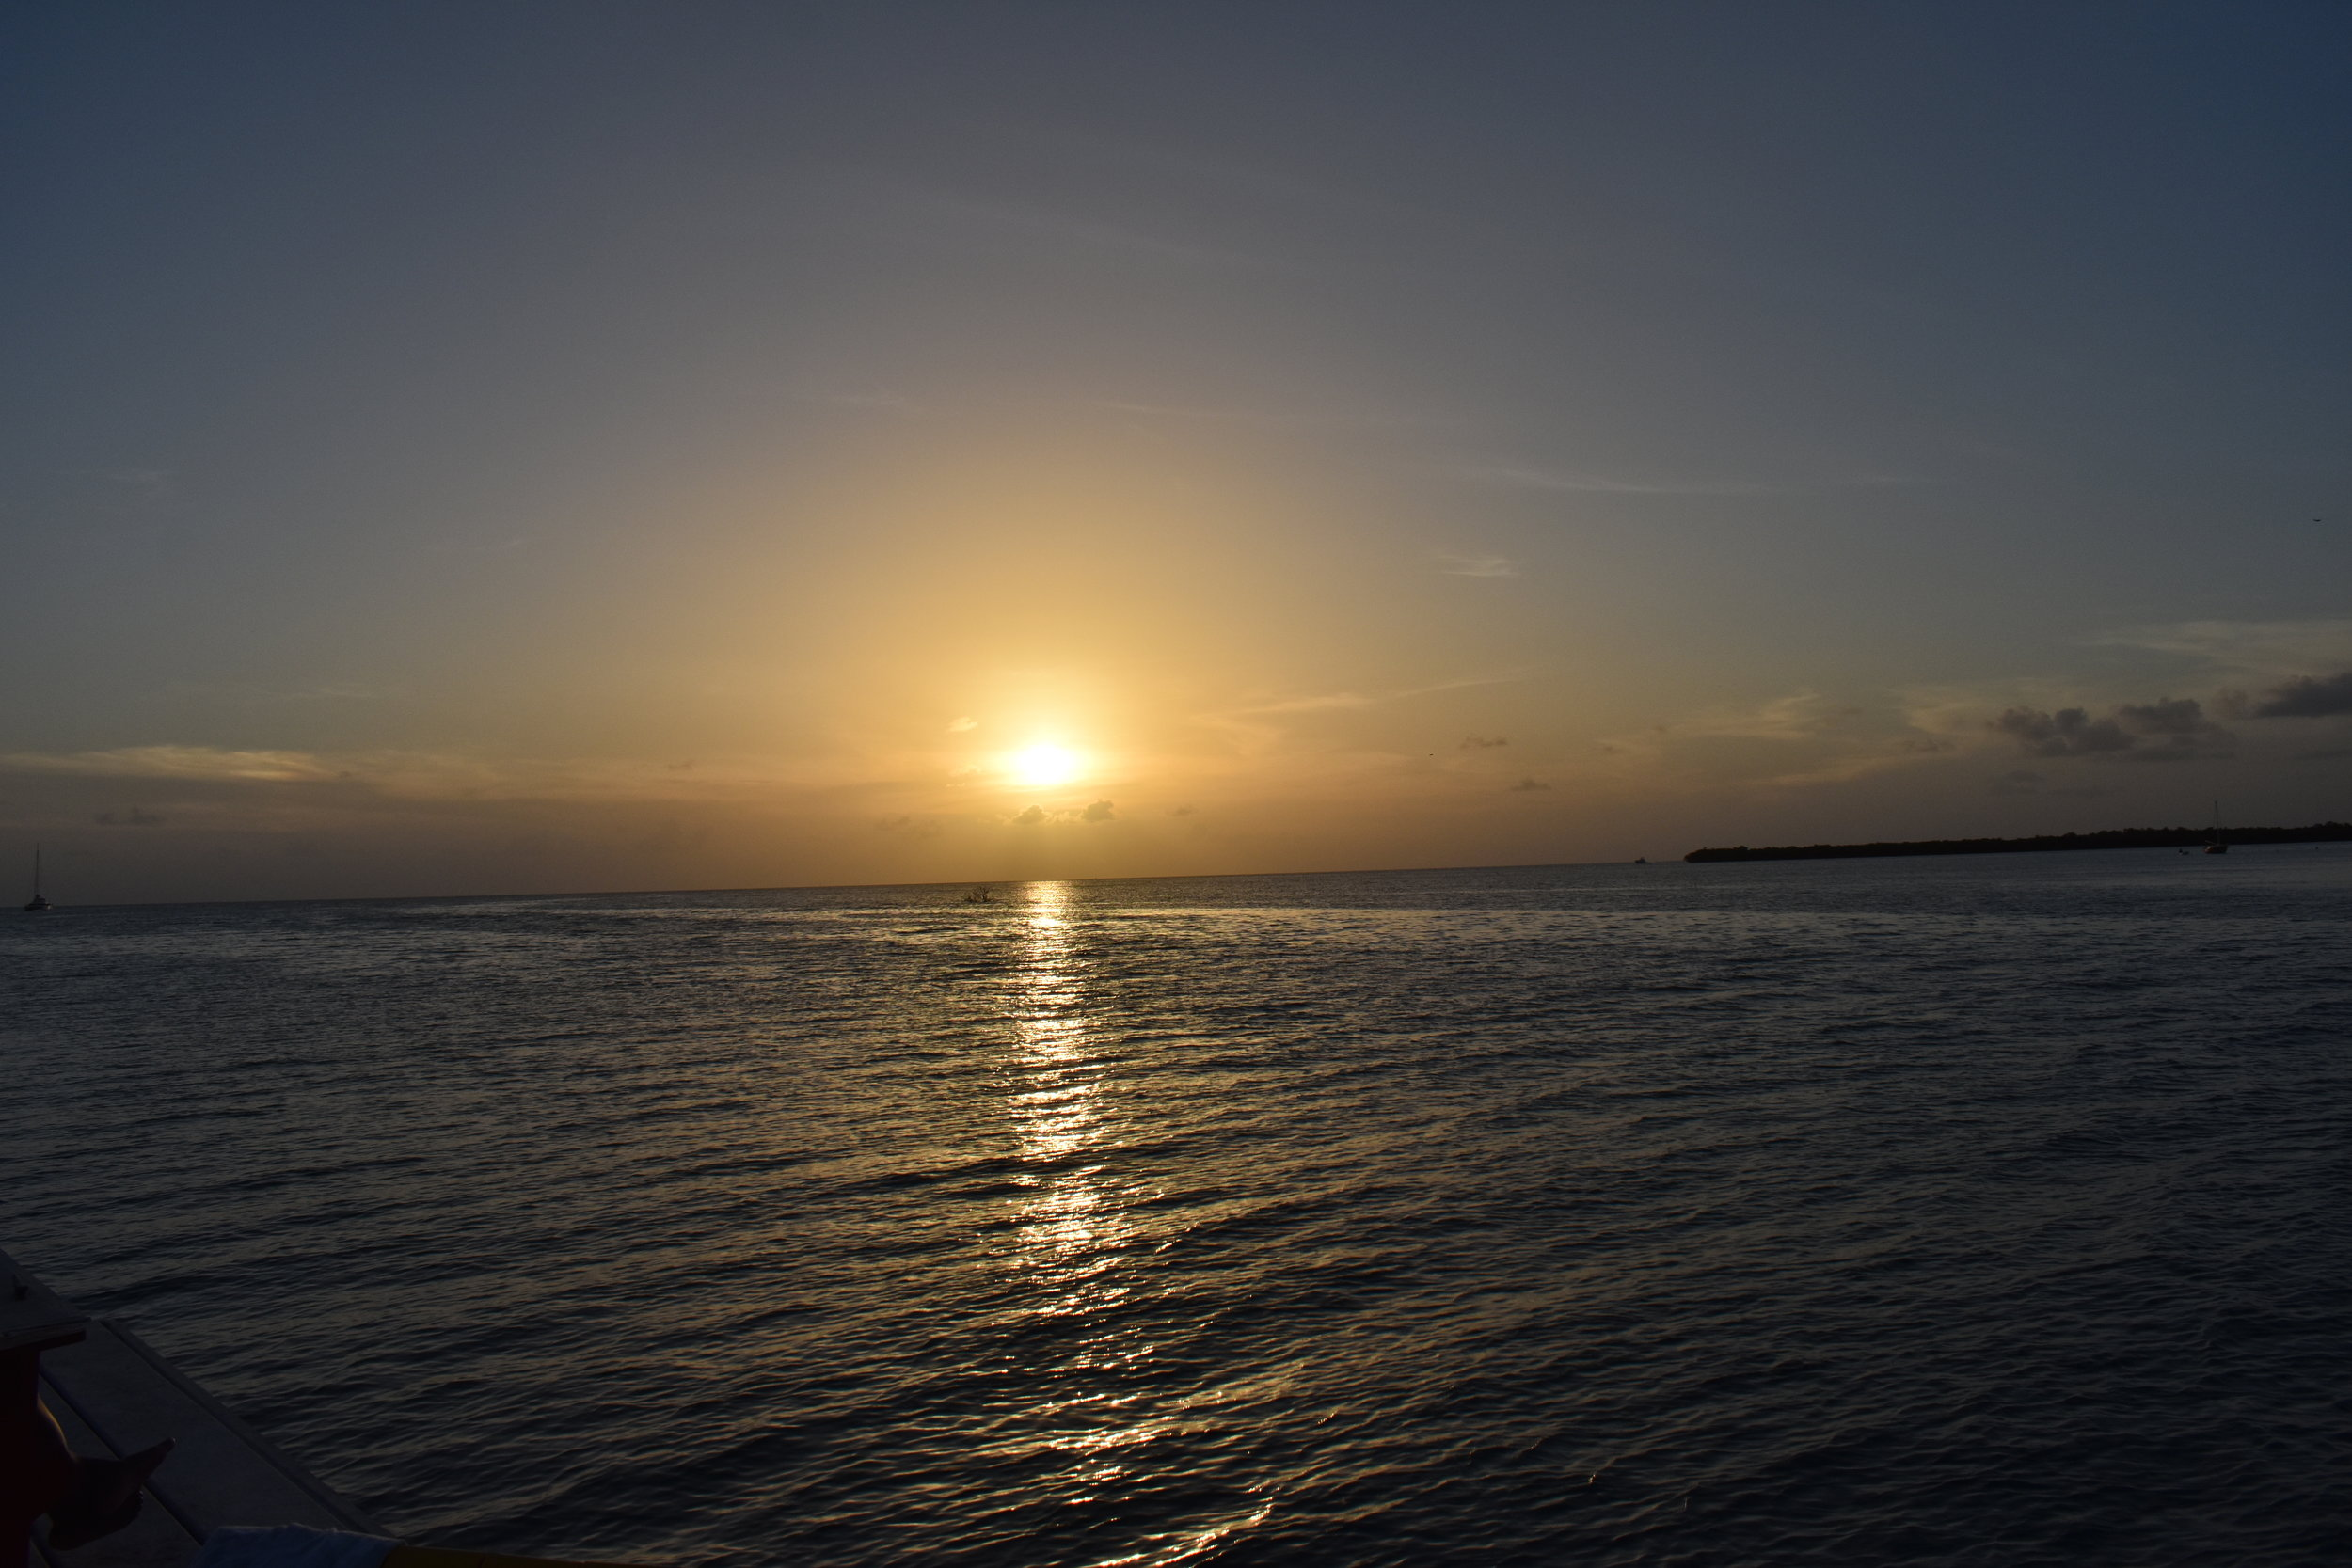 Por do sol visto no The Split, parte sul da ilha de Caye Caulker.